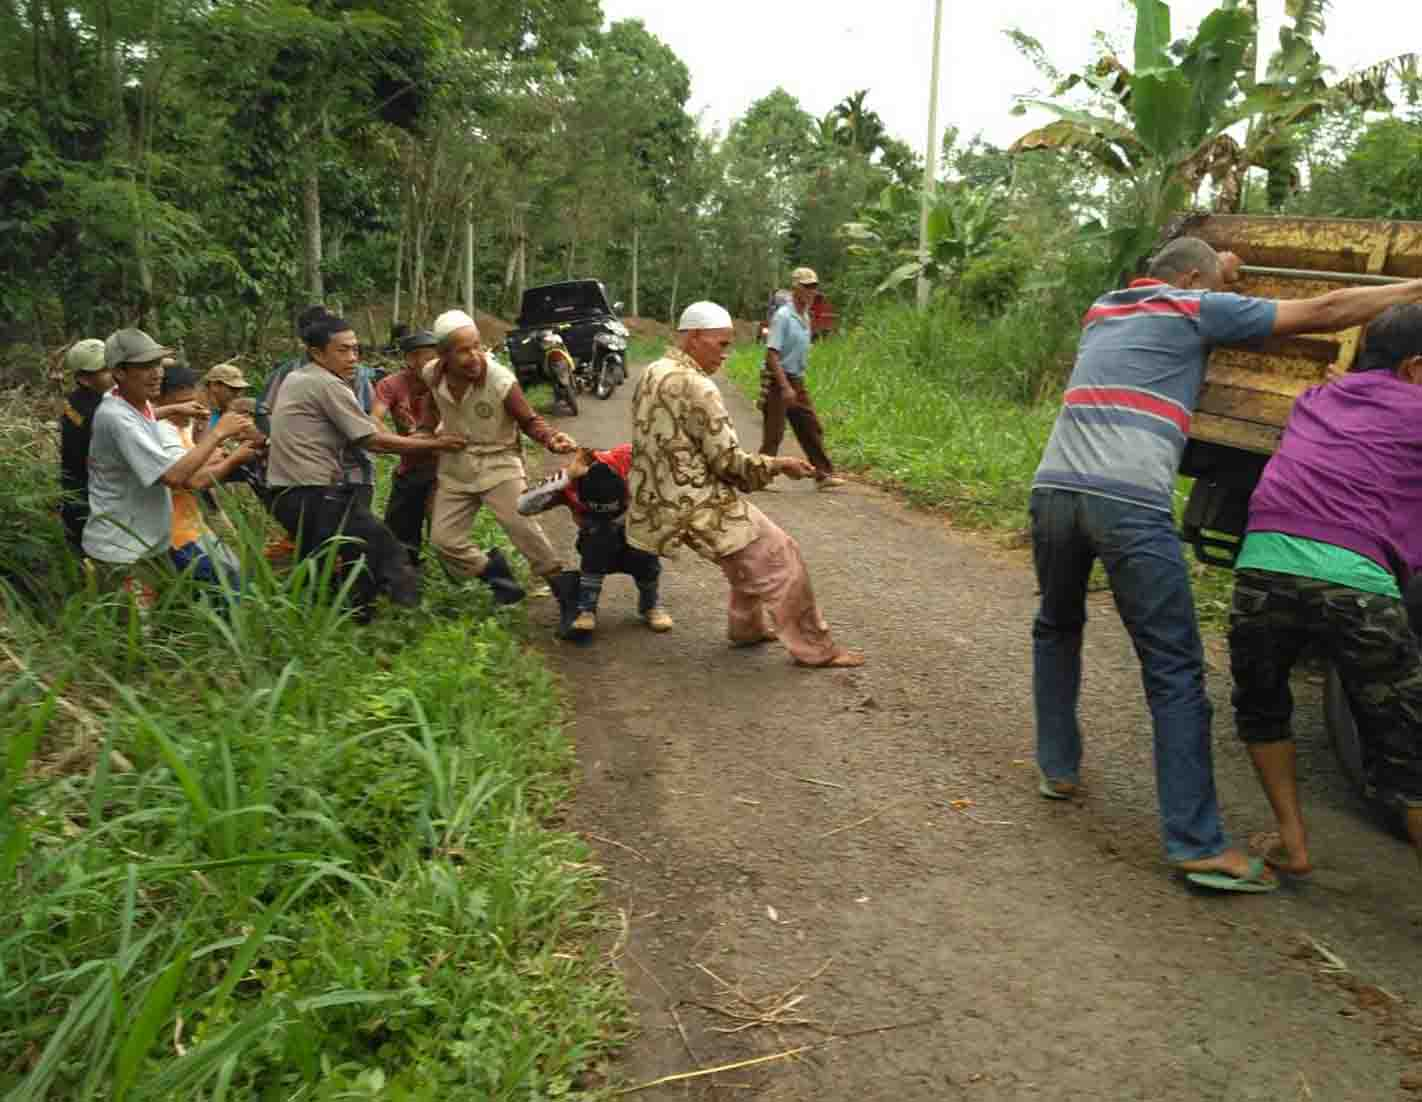 Truk Bermuatan Pasir Terperosok, Polisi dan Warga Bantu Evakuasi